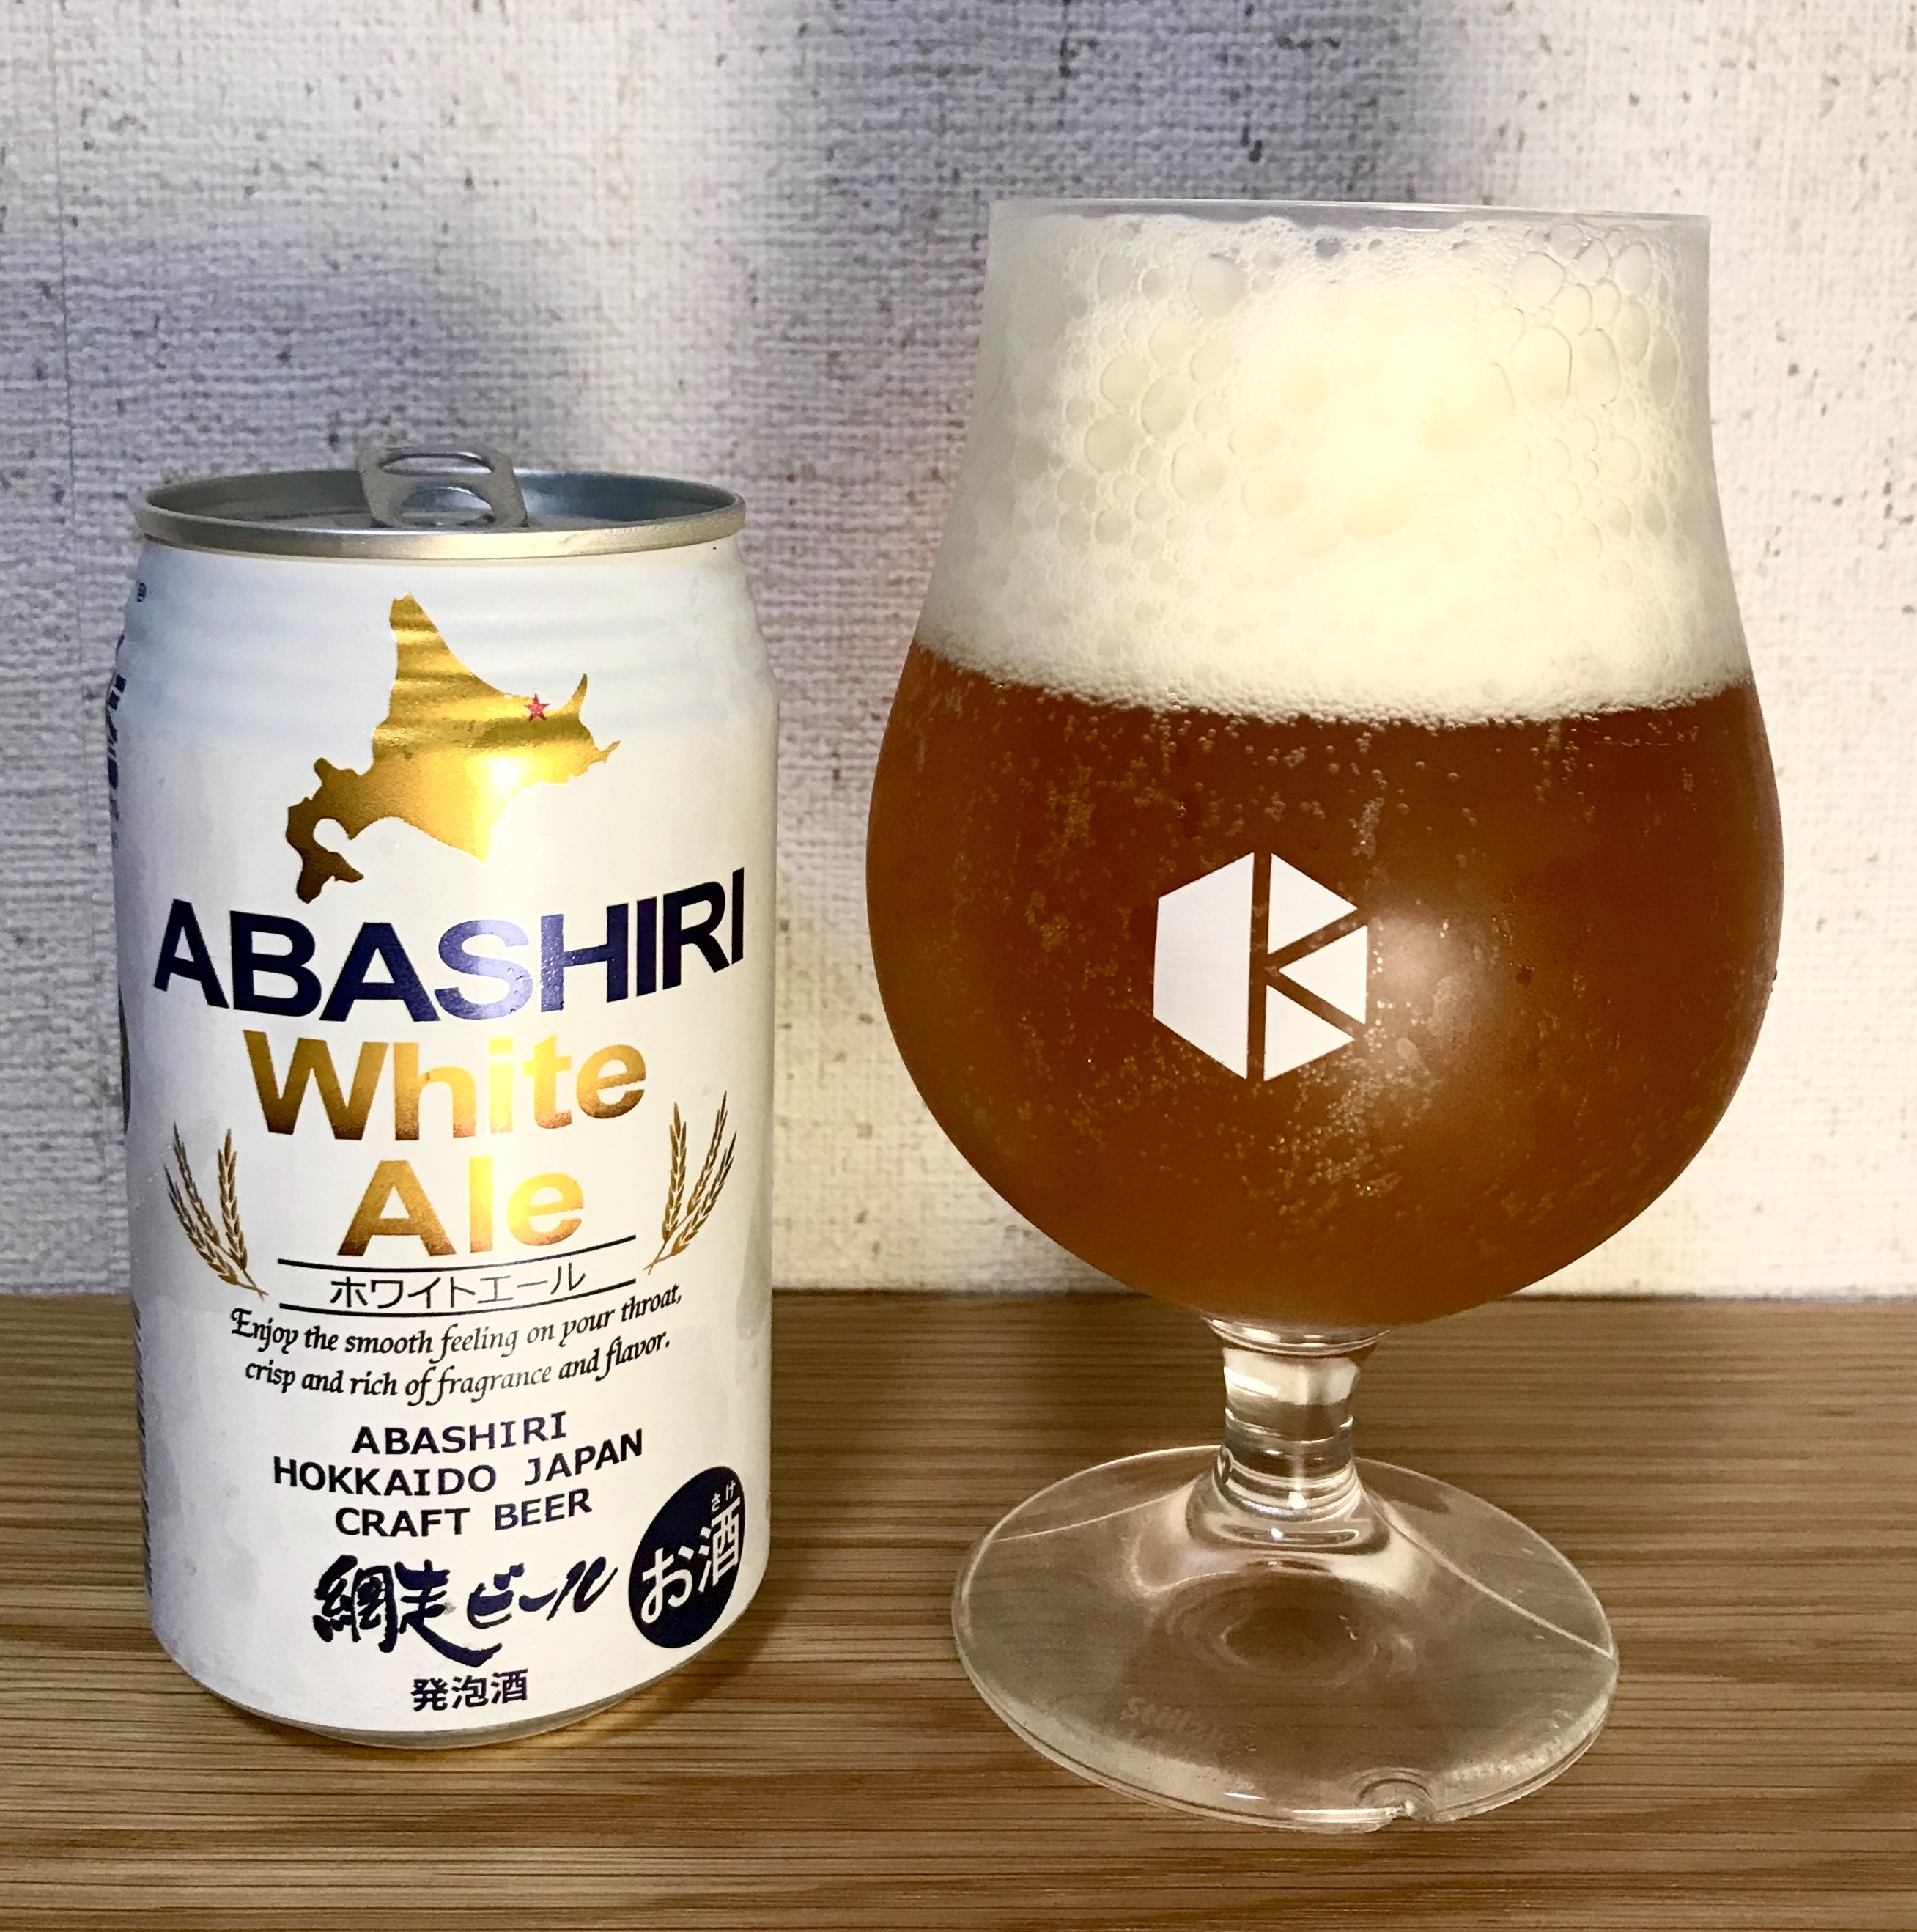 ABASHIRI White Ale_網走ビール_北海道_Image